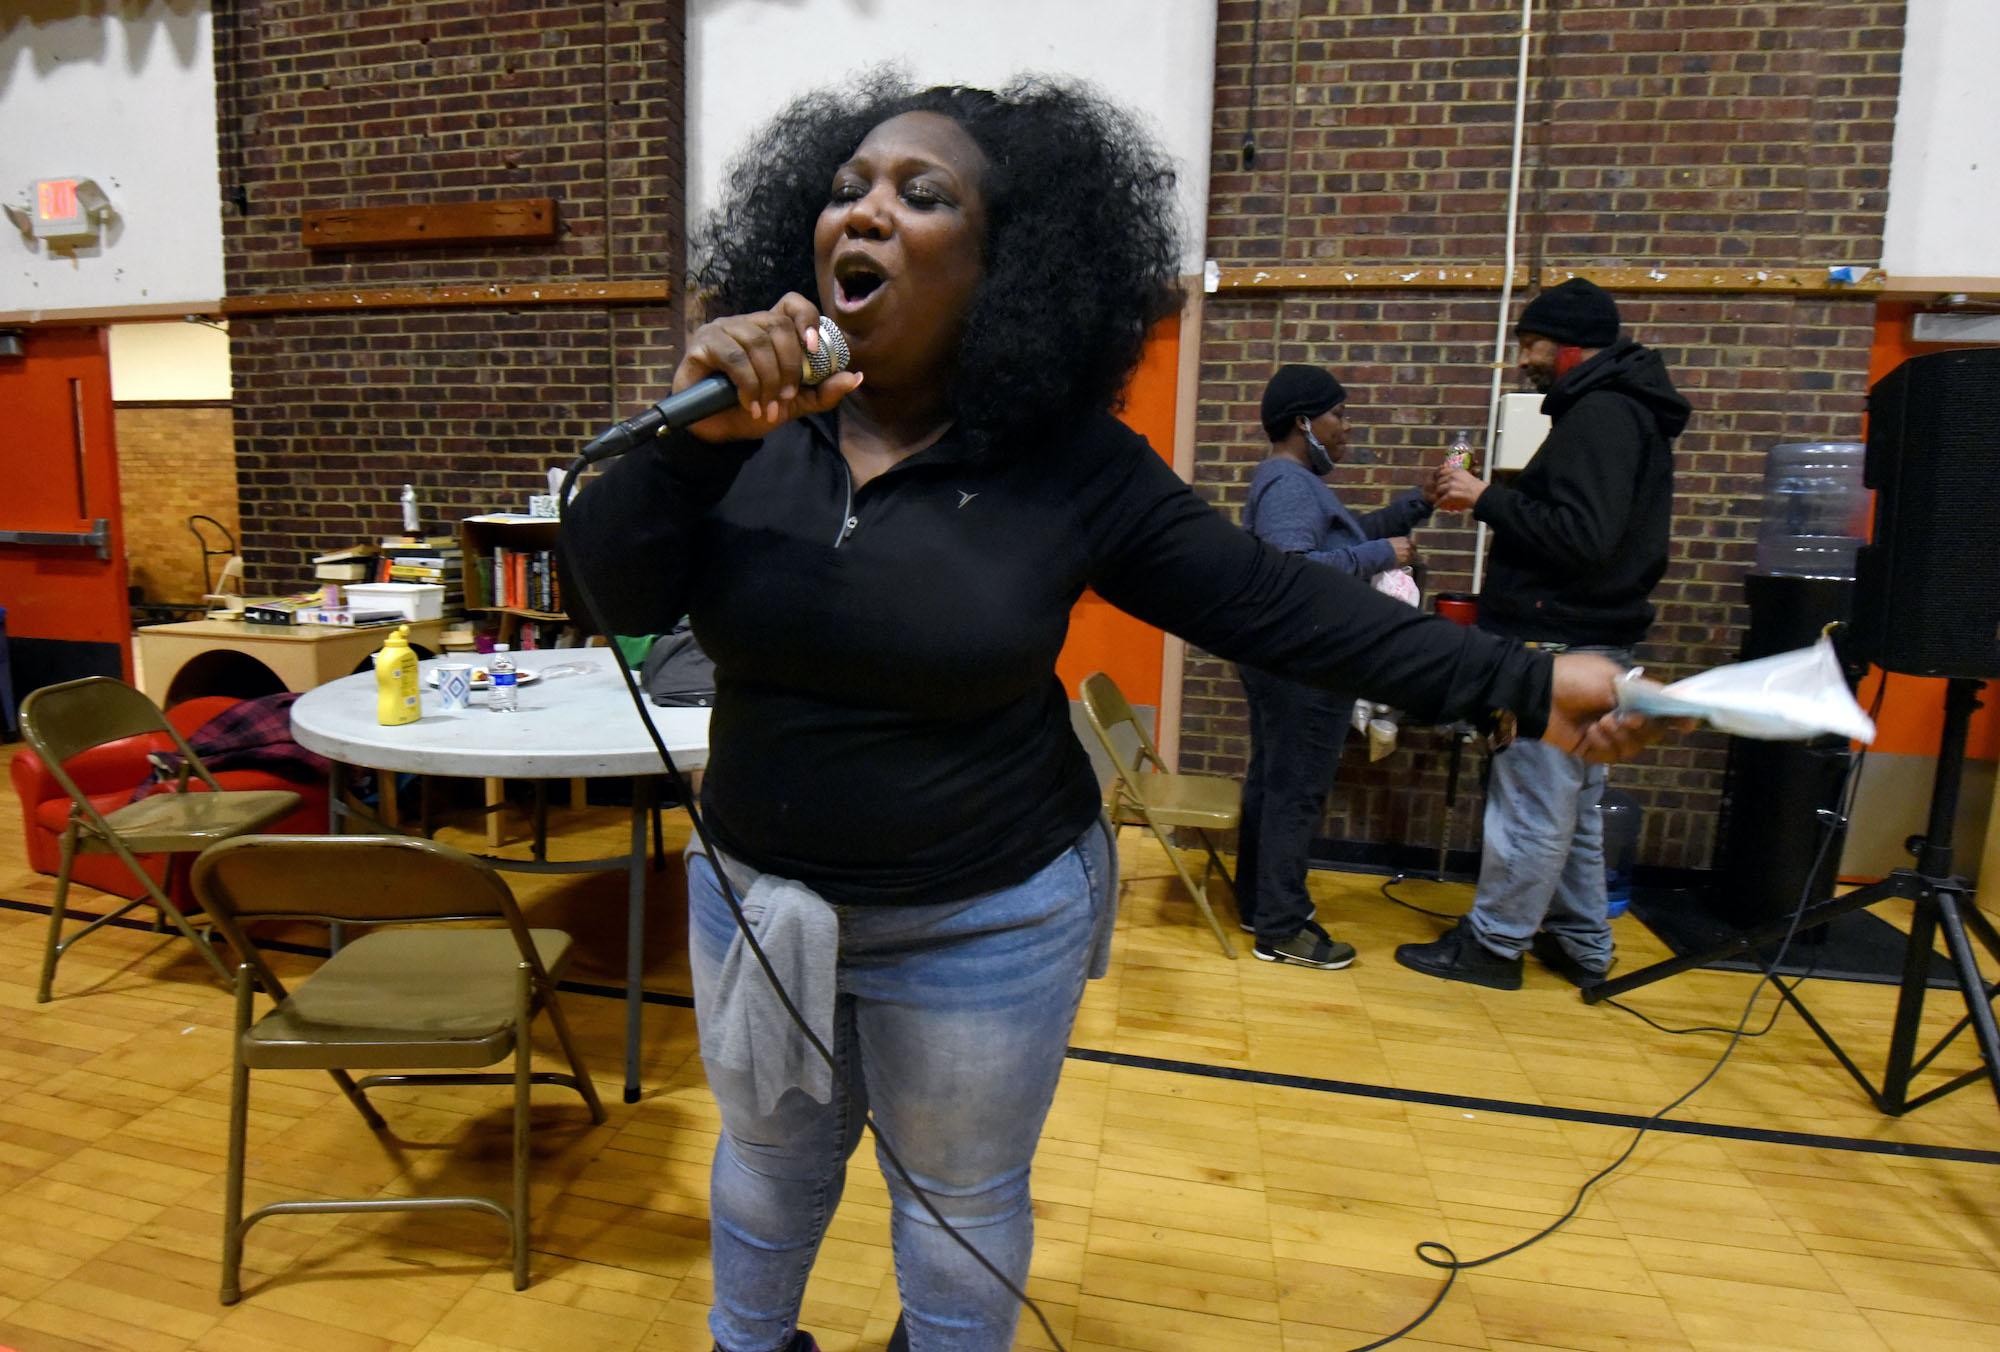 Tawanda Jones breaks into song to entertain her patrons